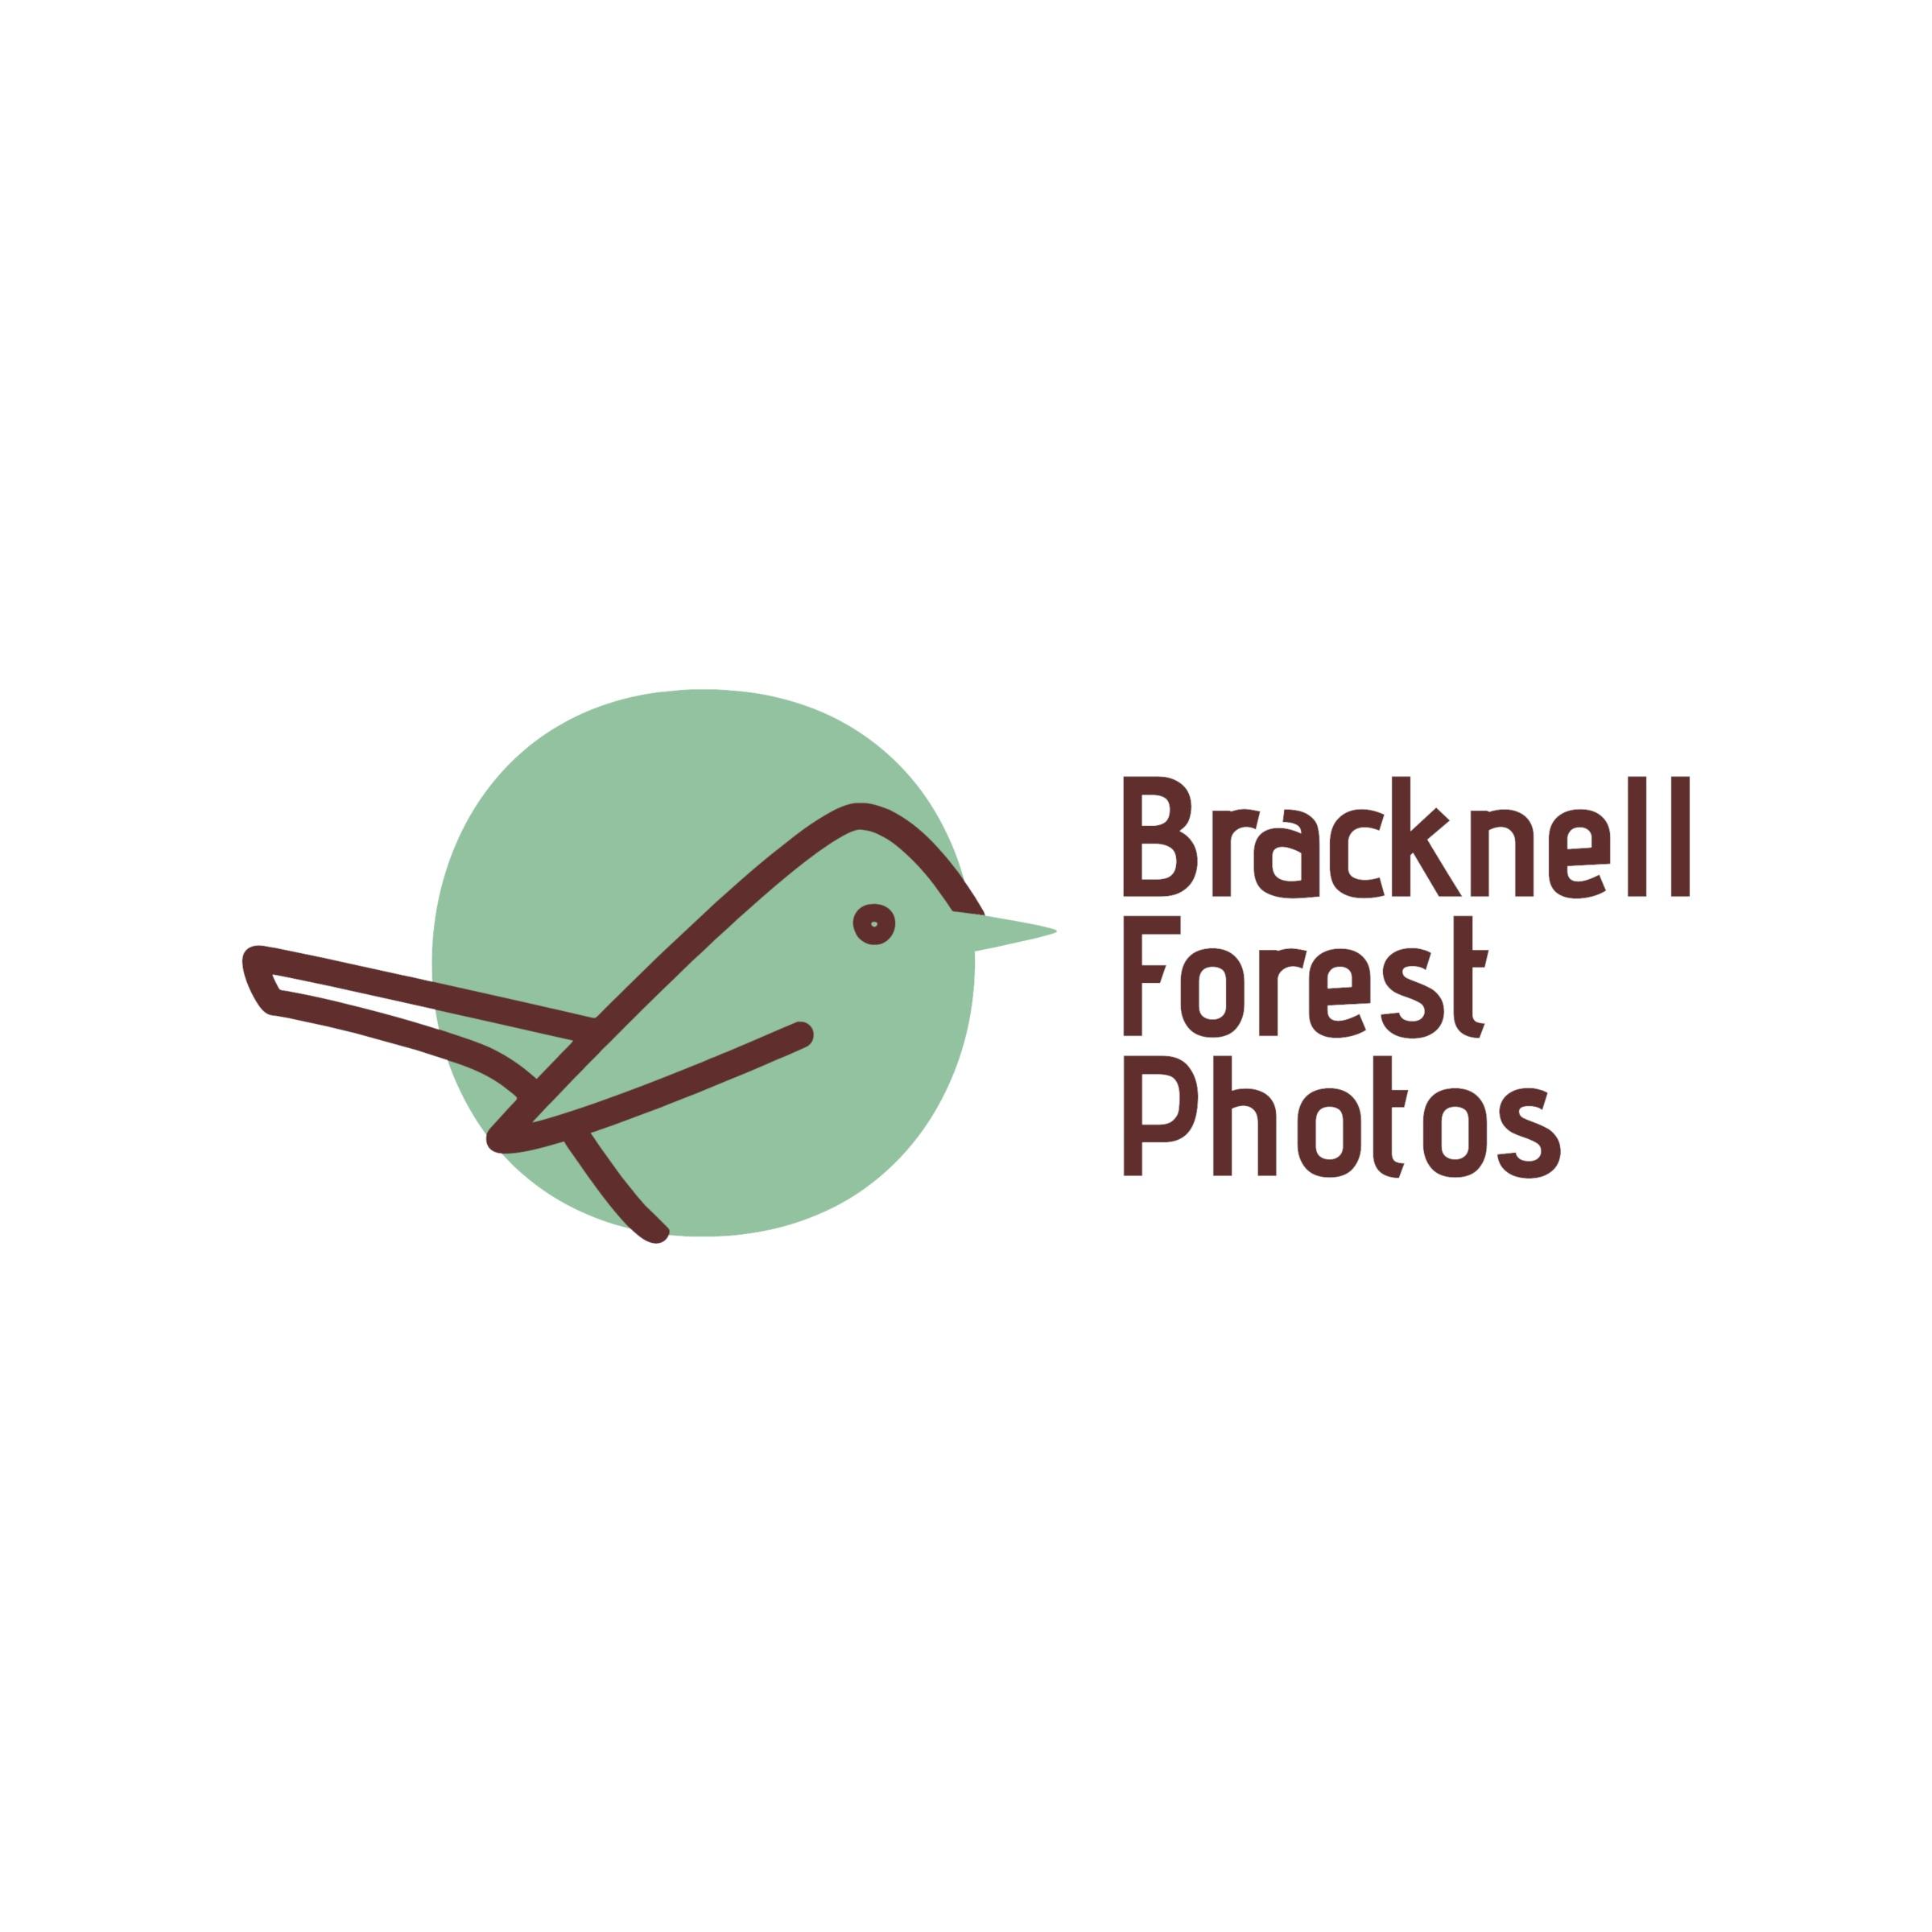 Bracknell Forest Photos